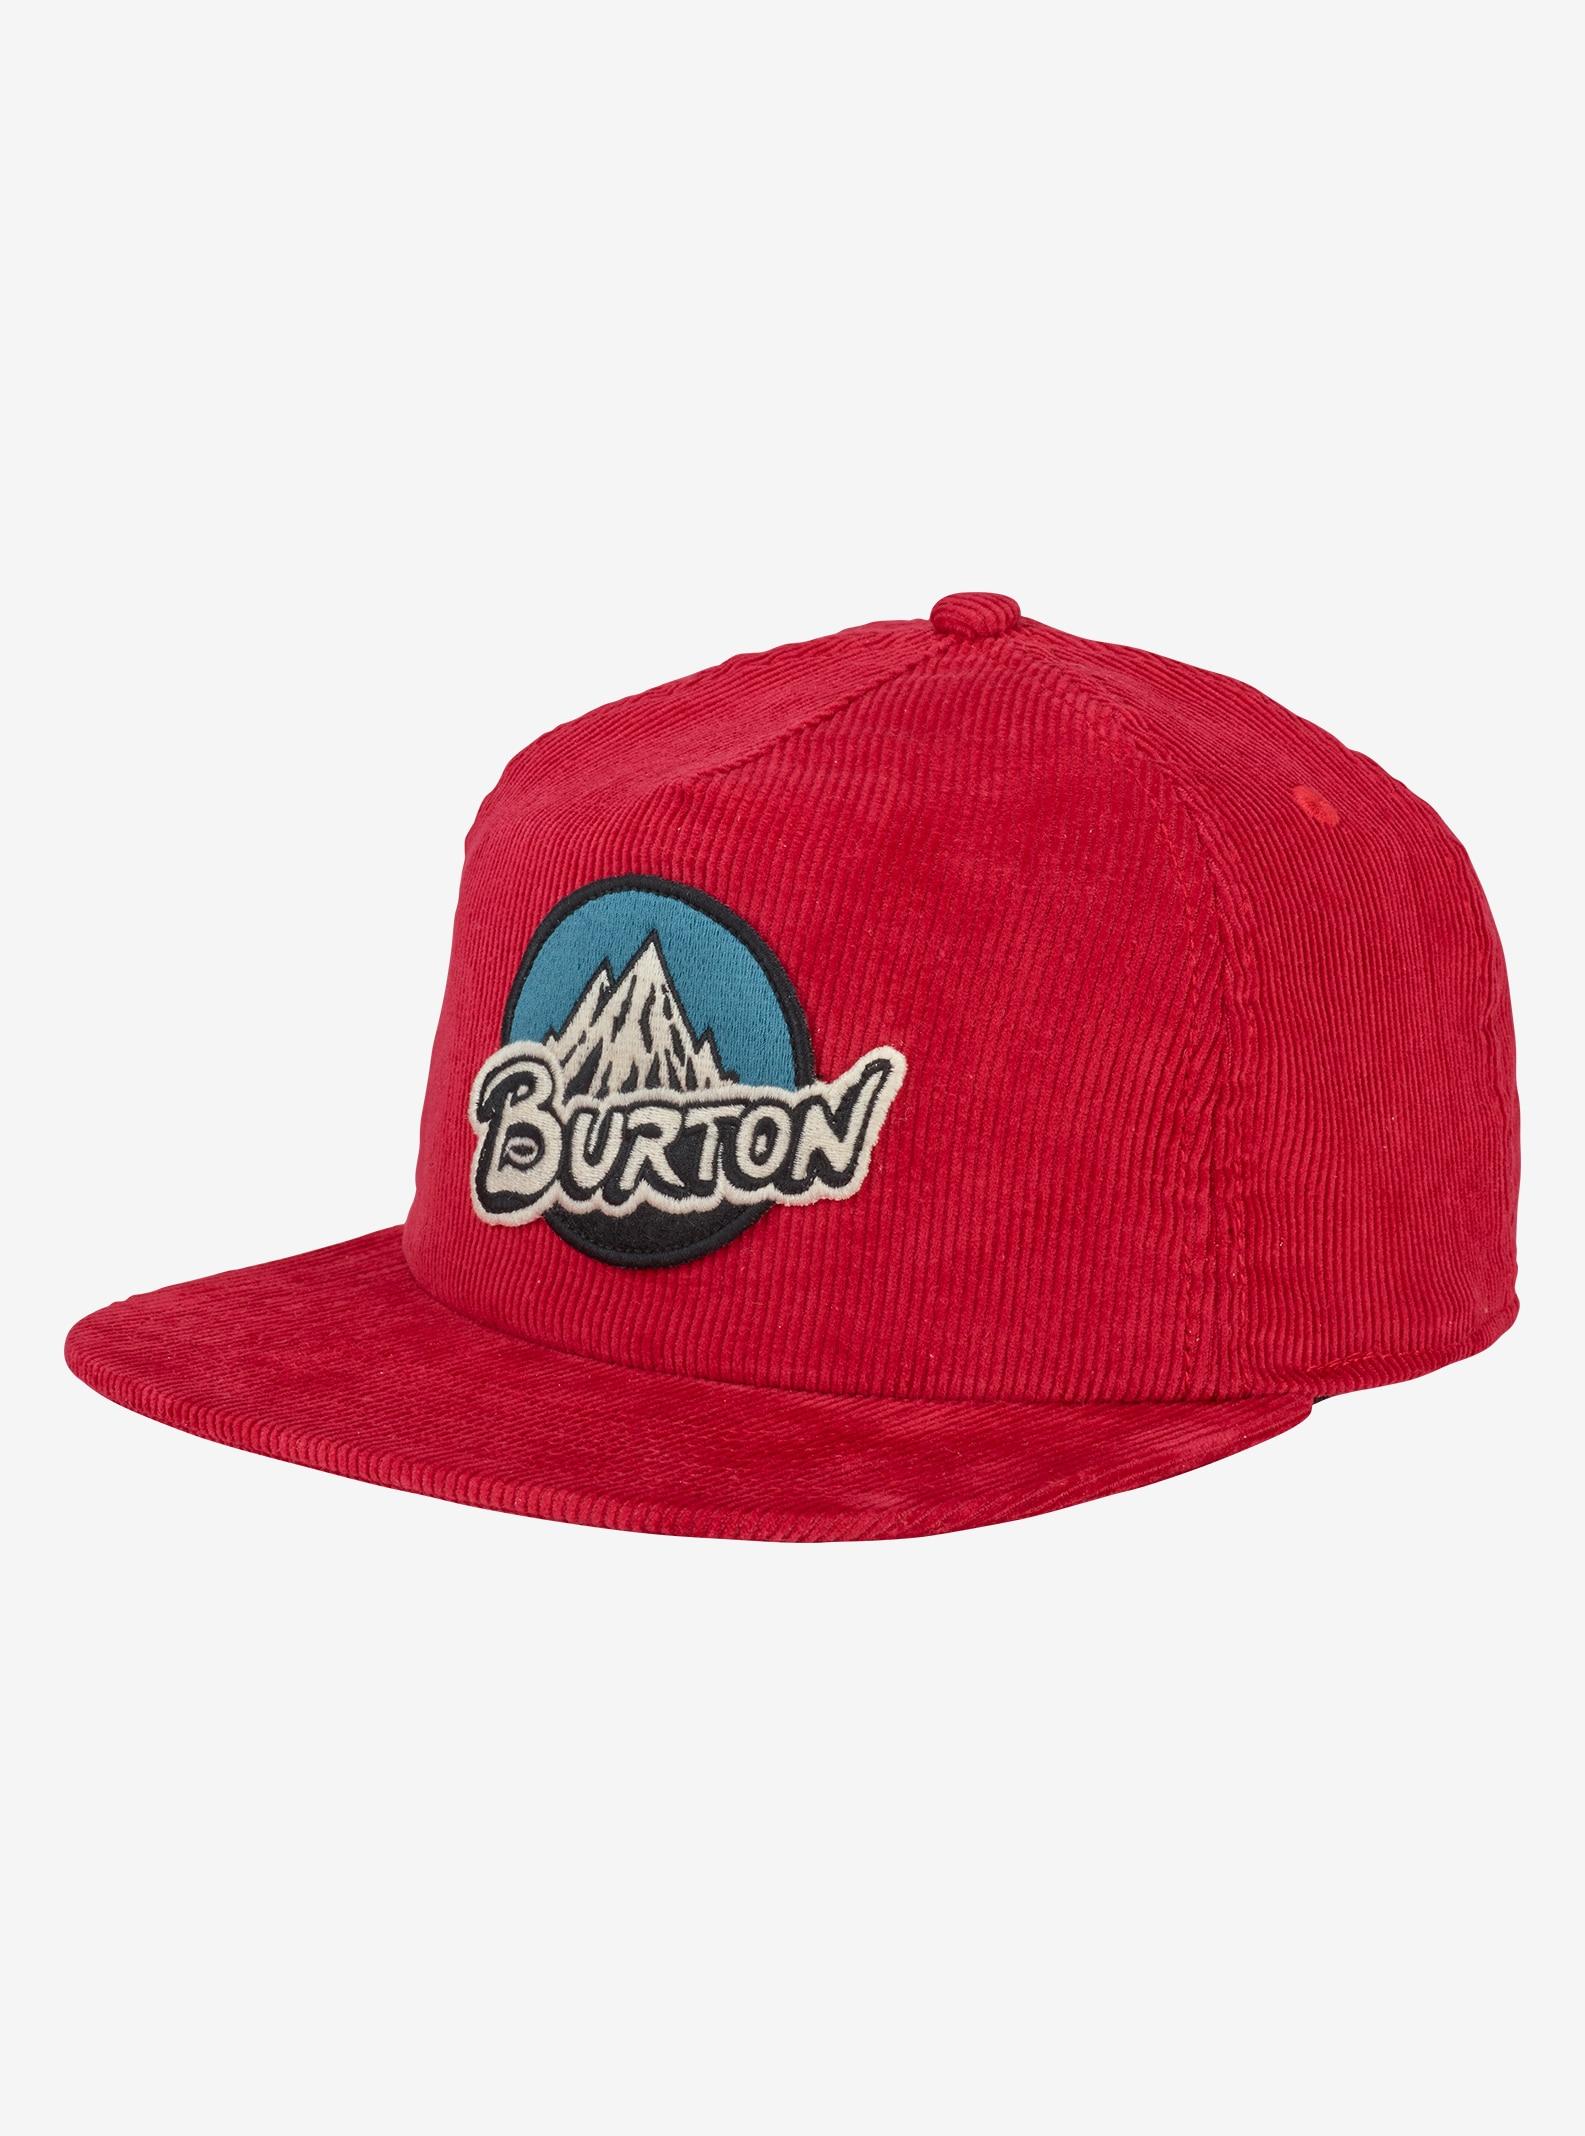 Boys' Burton Retro Mountain Hat shown in Fiery Red